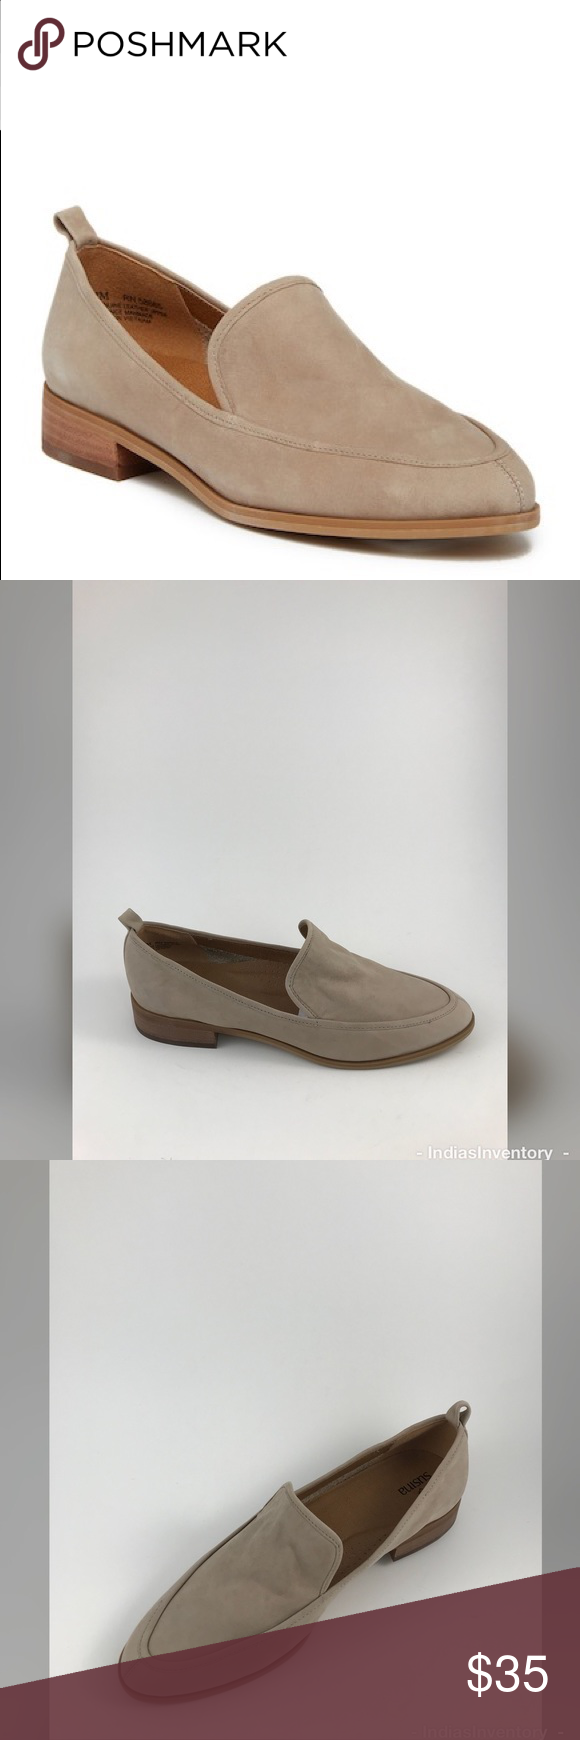 fd03ba81928 SUSINA Kellen Almond Toe Loafer Susina Kellen Almond Toe Loafer Size 8.5M  TAUPE LEATHER New